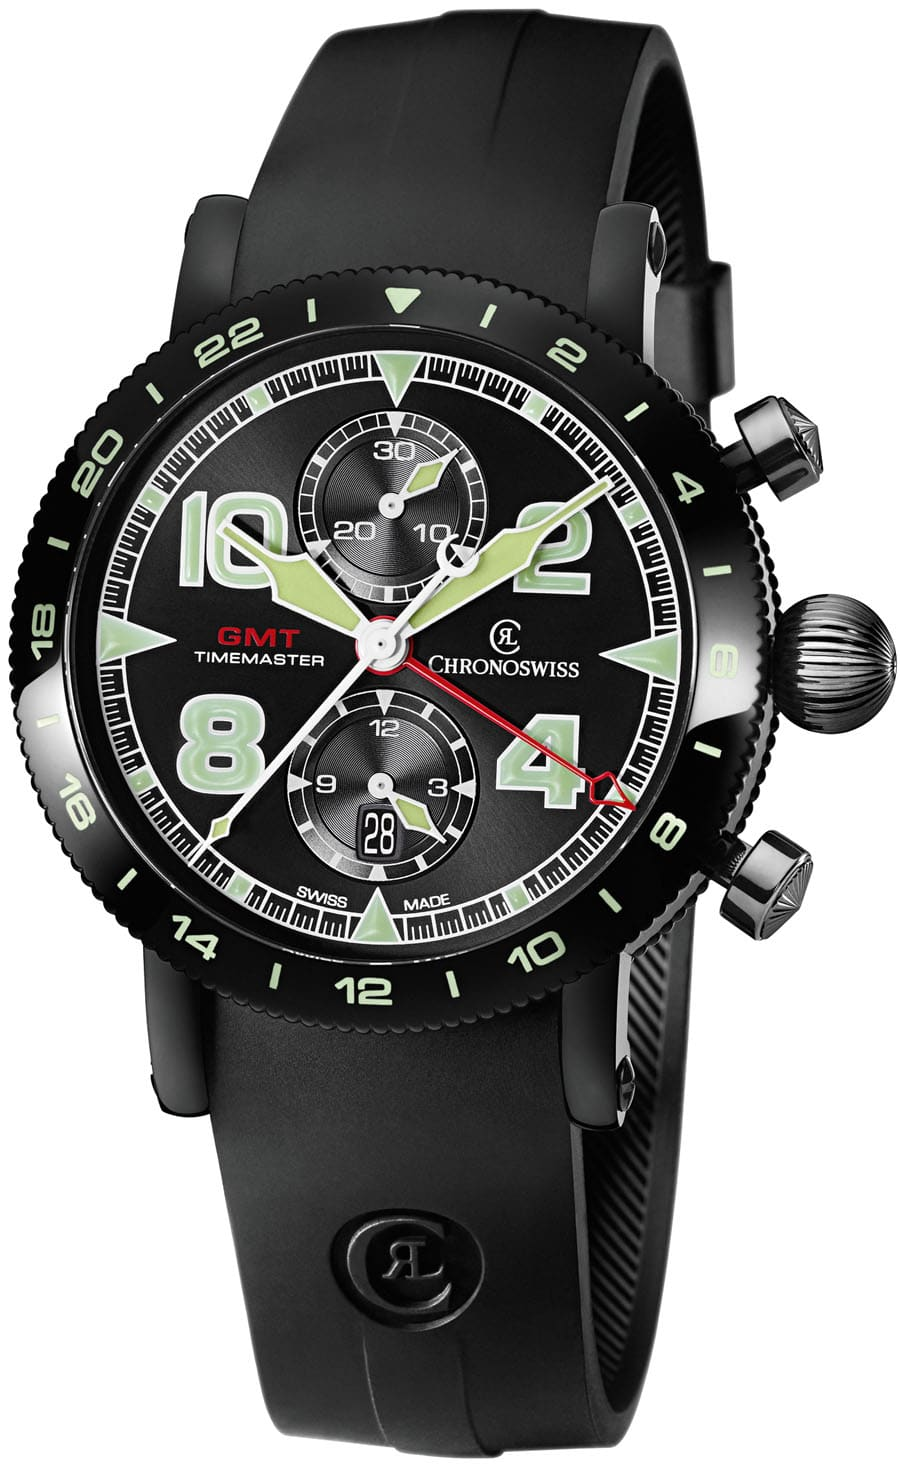 Chronoswiss: Timemaster Chronograph GMT